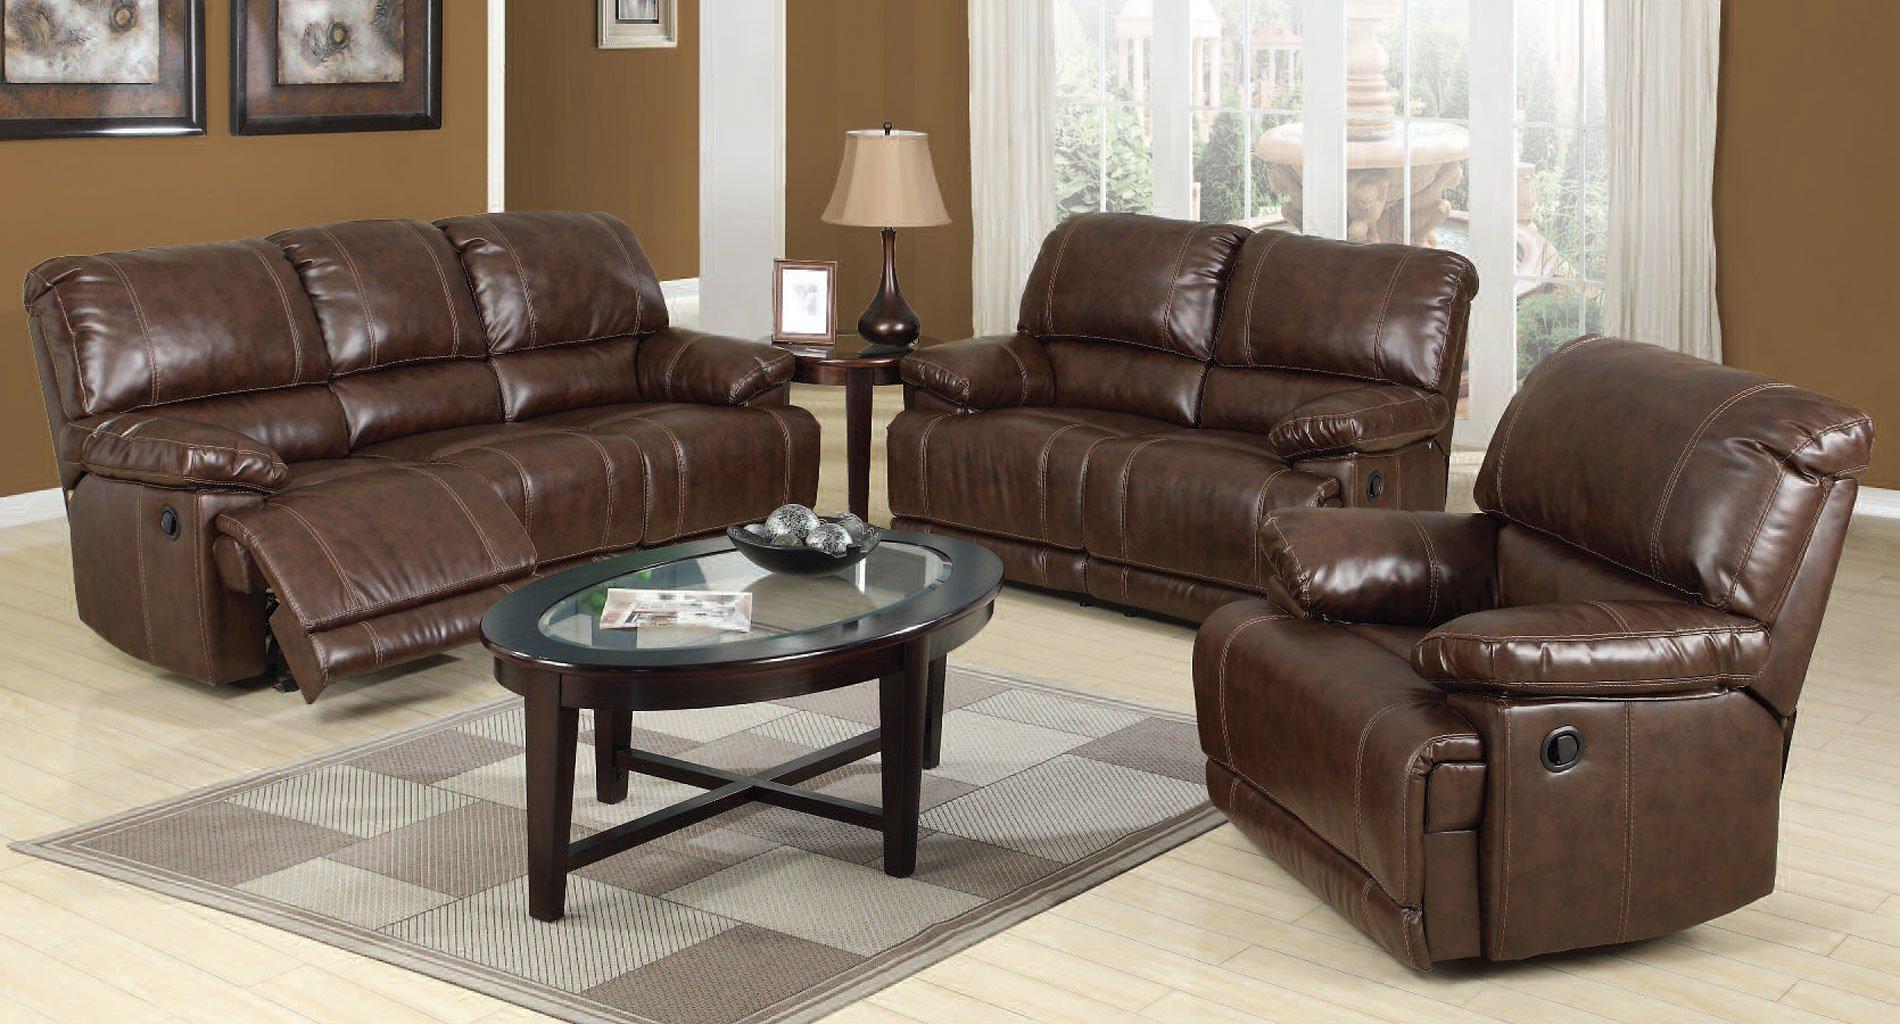 Daishiro reclining living room set living room sets for Living room furniture 0 finance